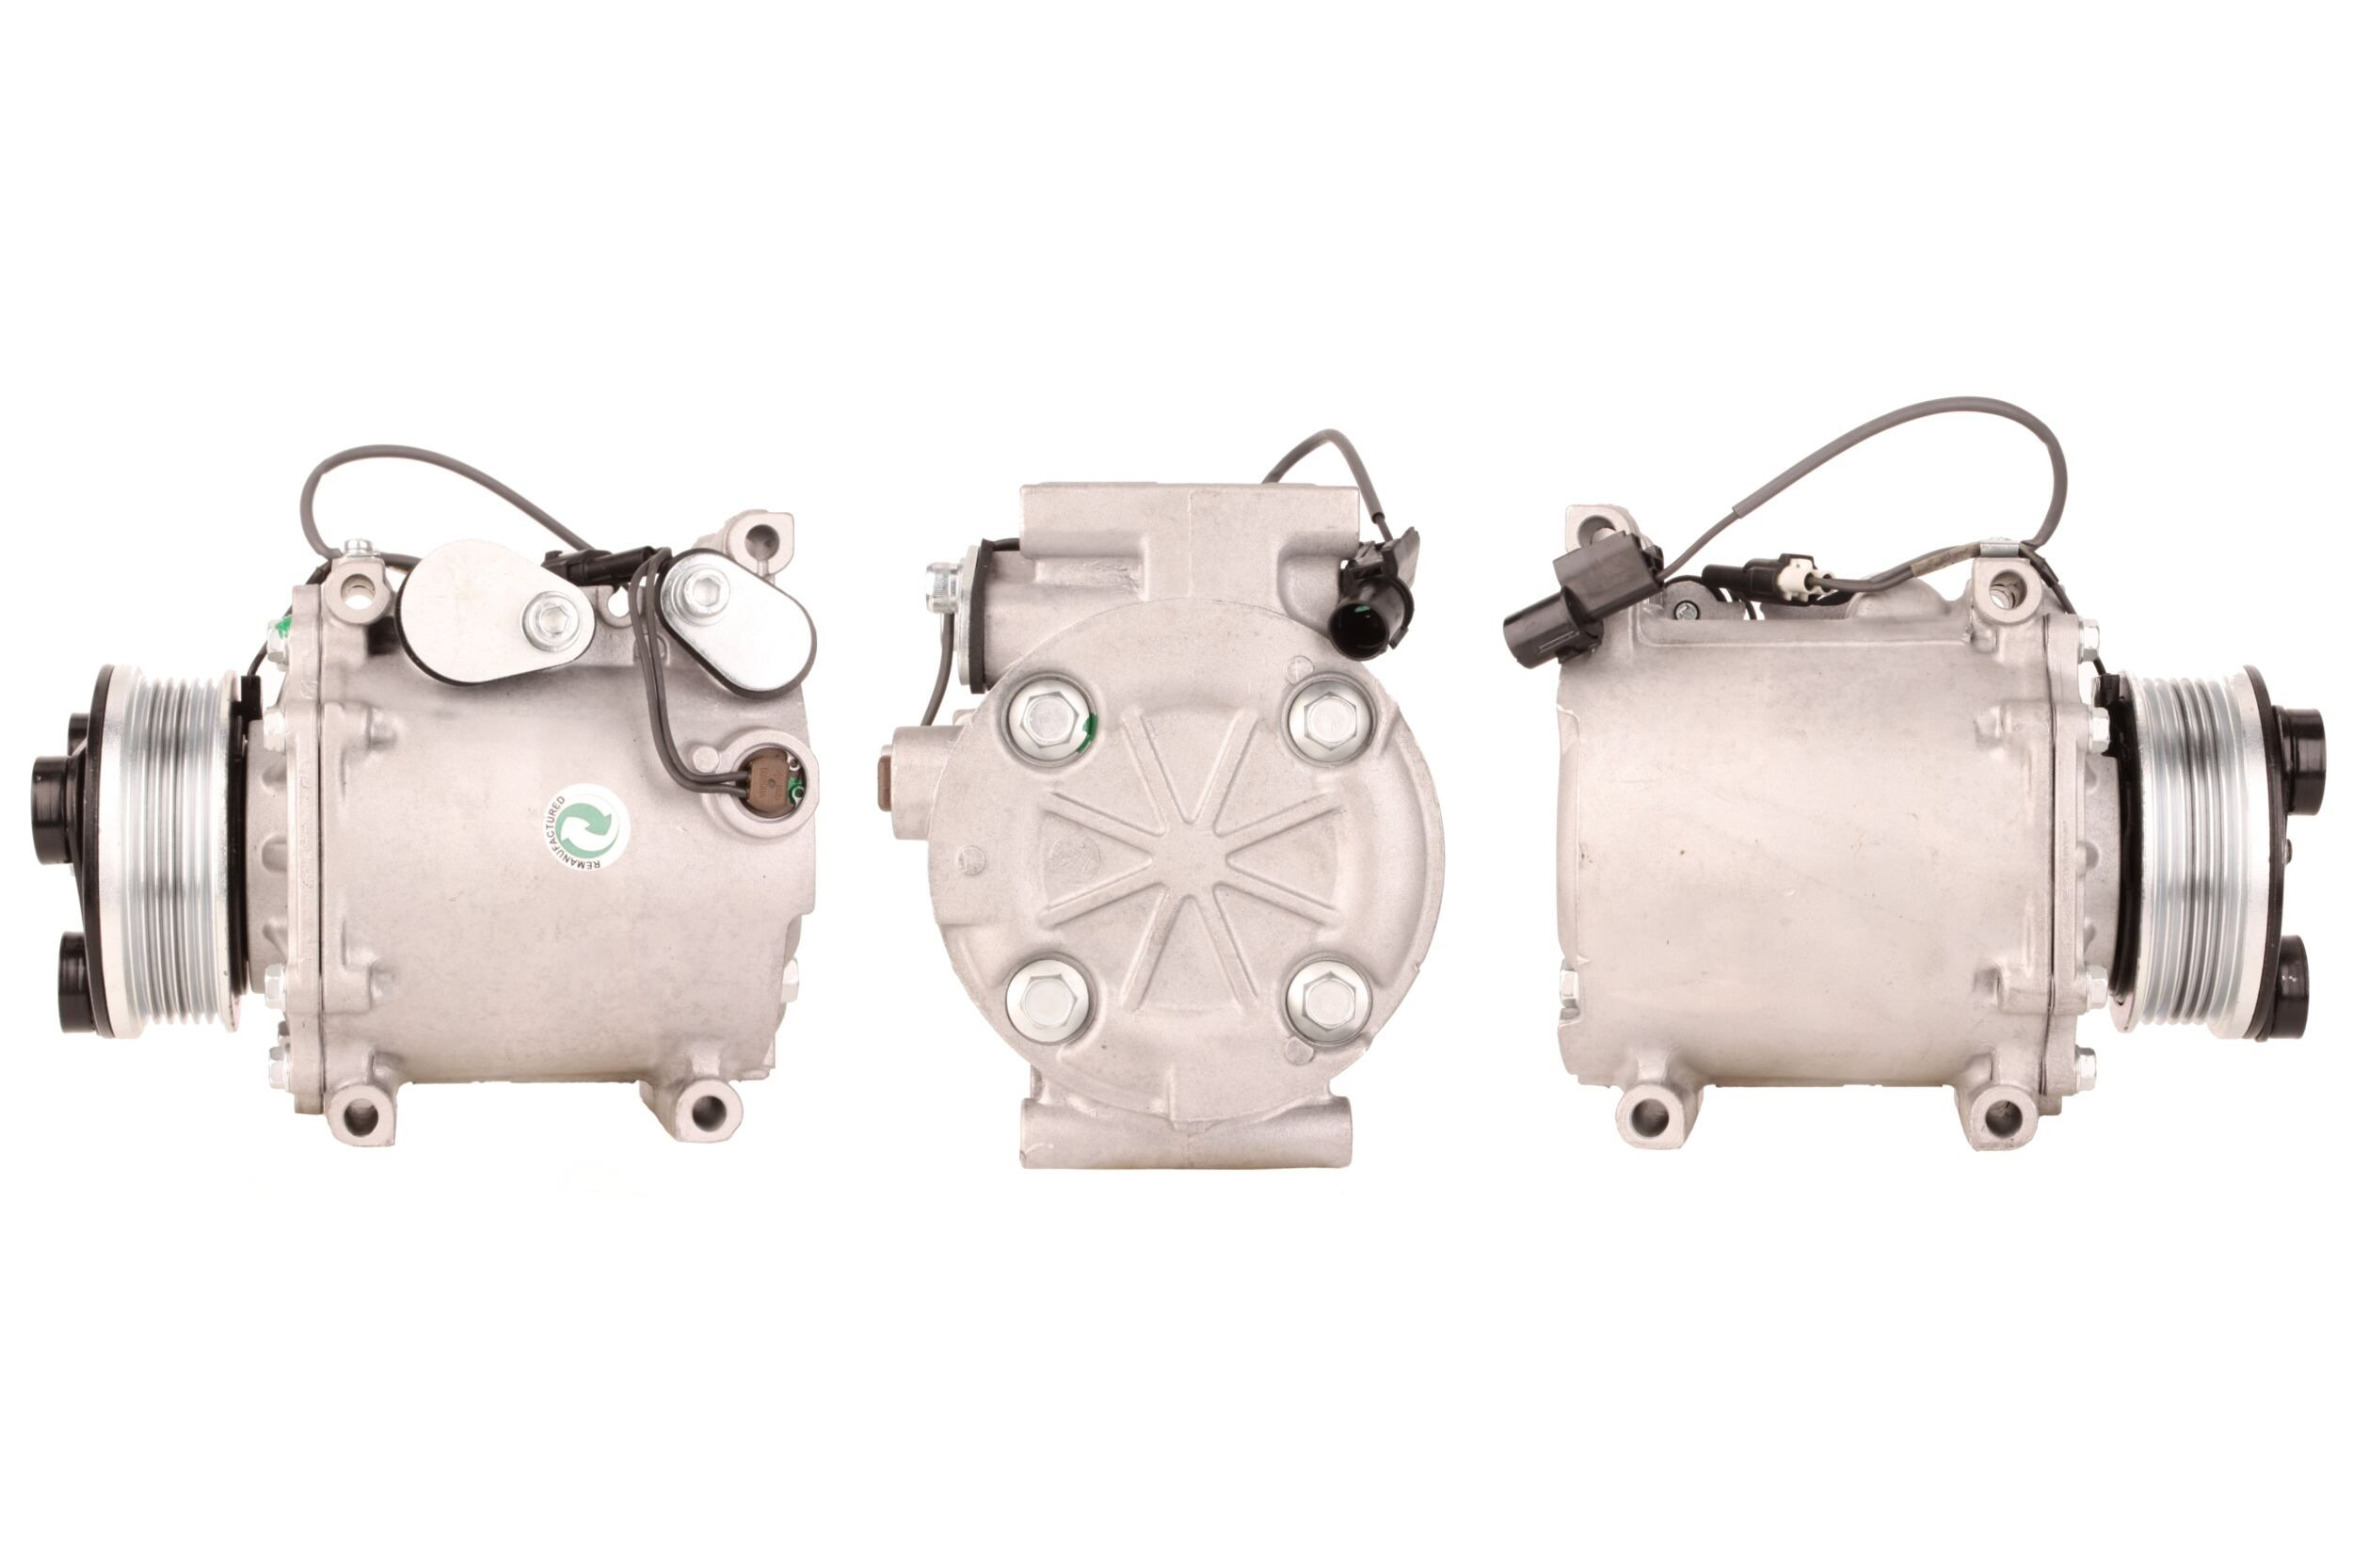 Original MITSUBISHI Kompressor Klimaanlage 51-0623